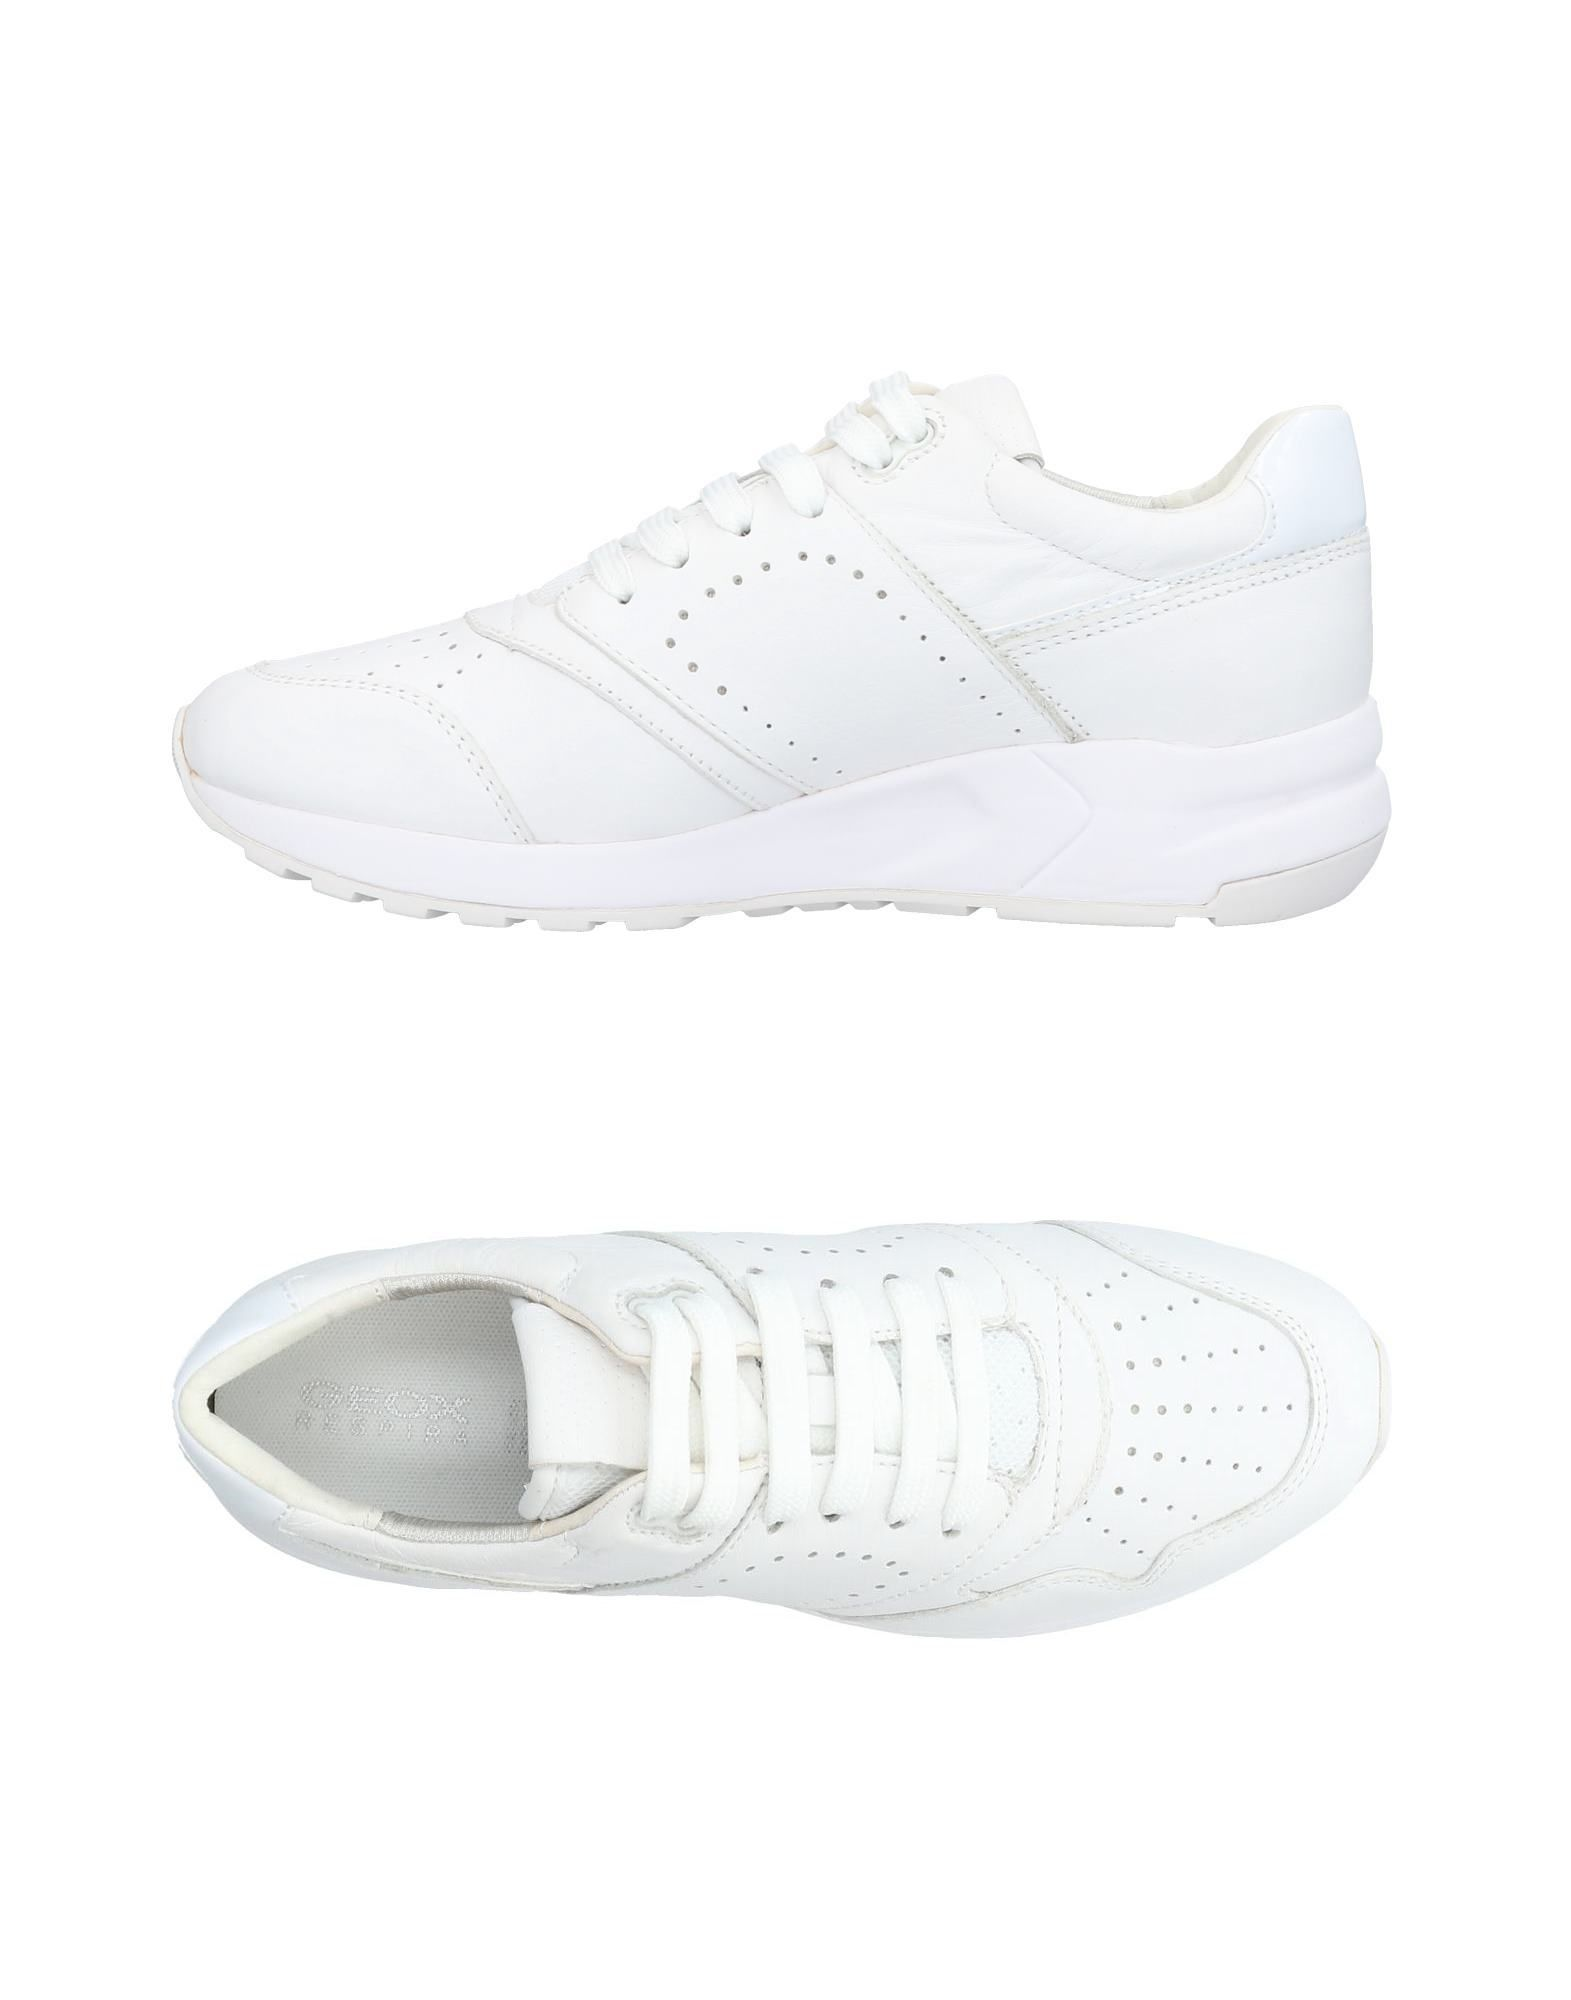 Geox Sneakers Damen  11192014VP Gute Qualität beliebte Schuhe